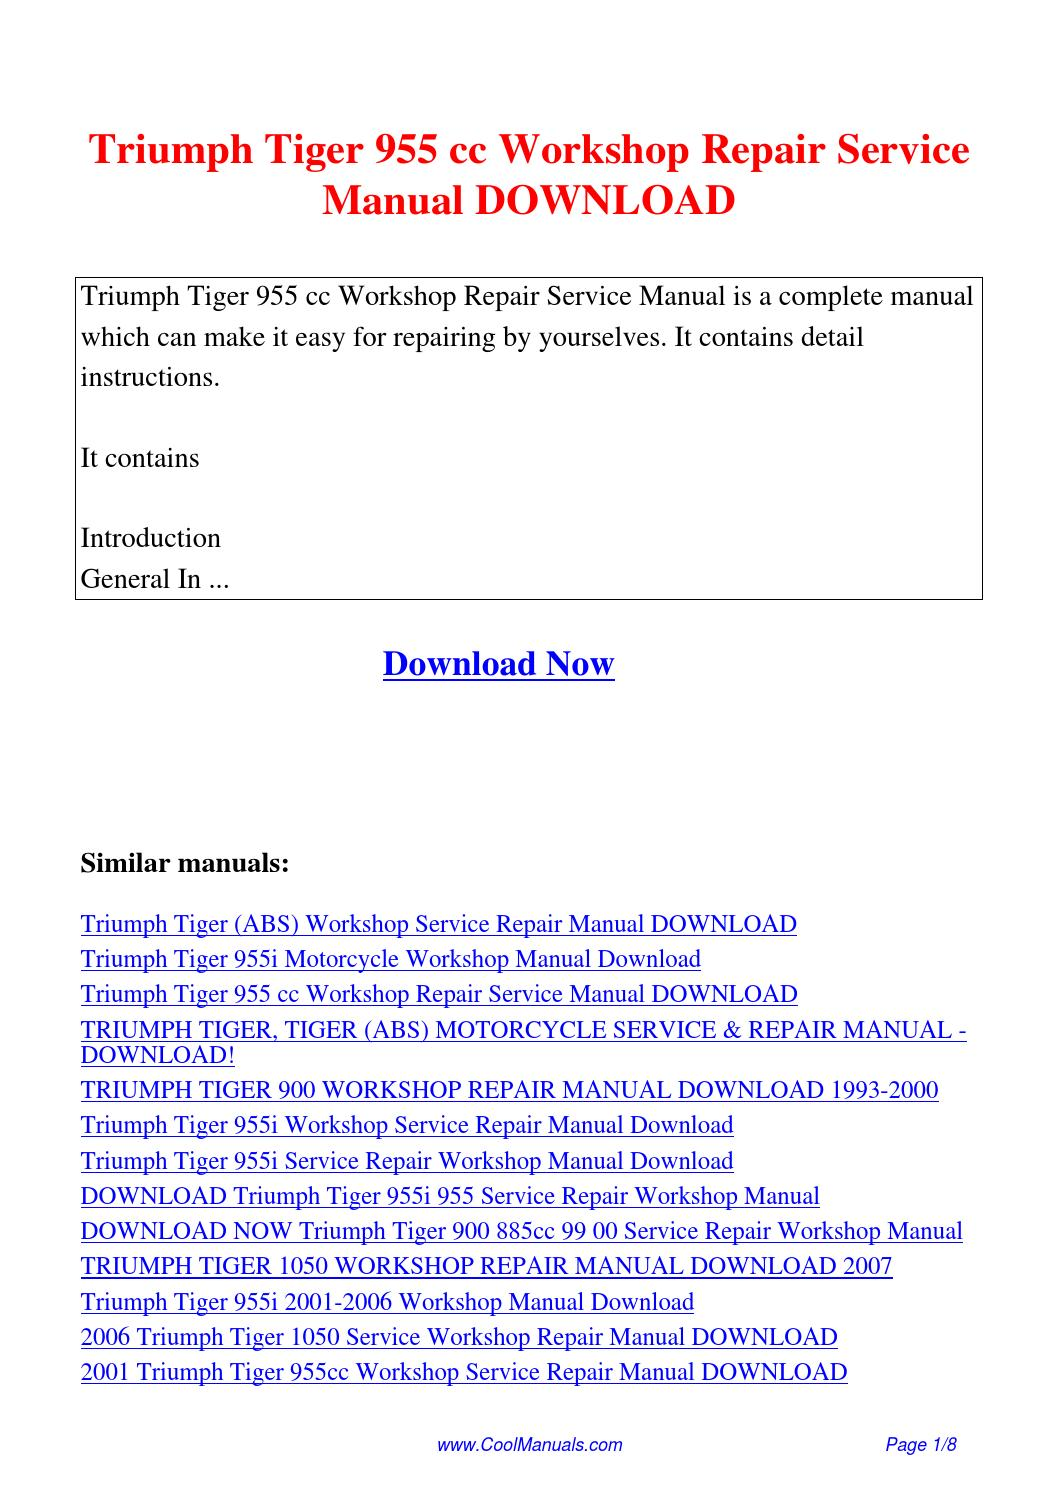 Triumph Tiger 955 cc Workshop Repair Service Manual.pdf by Linda Pong -  issuu